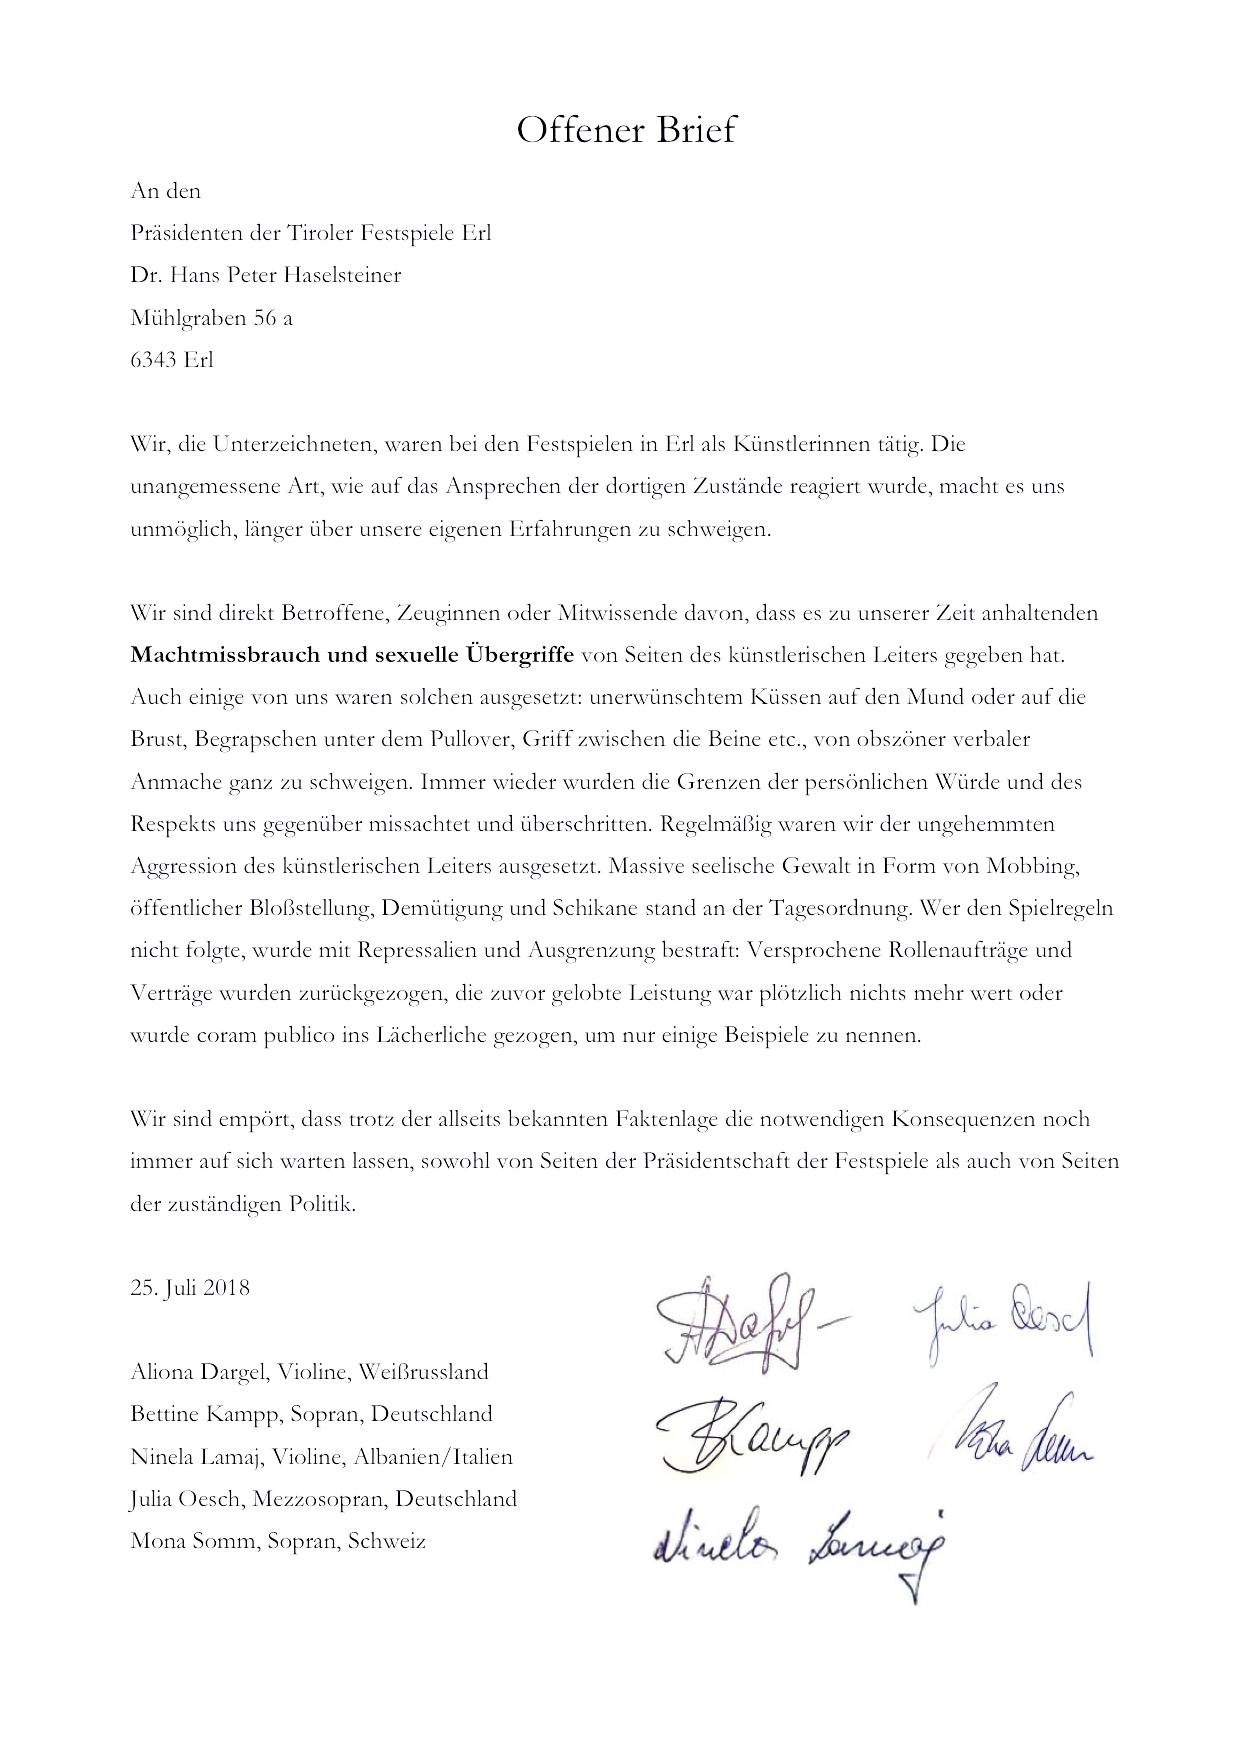 Offener Brief An Den Präsidenten Der Tiroler Festspiele Erl